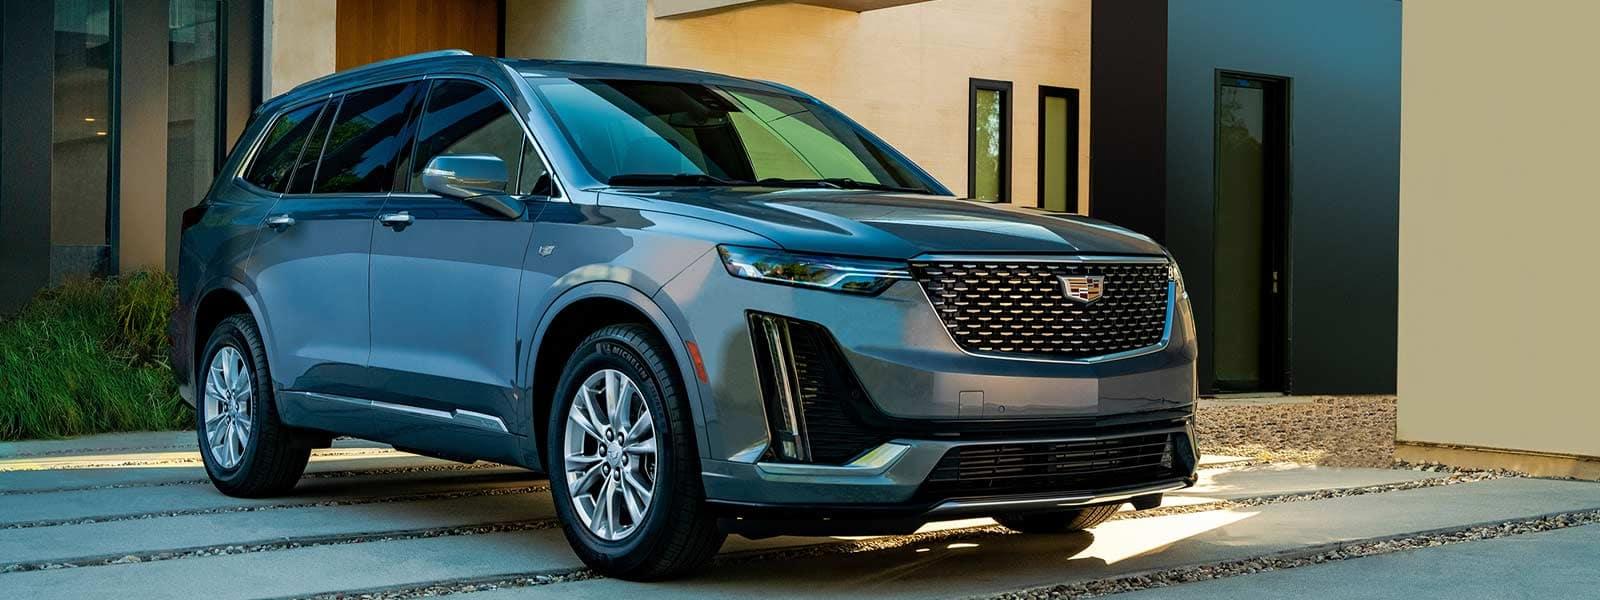 Buy new 2021 Cadillac XT6 in Stanleytown Virginia